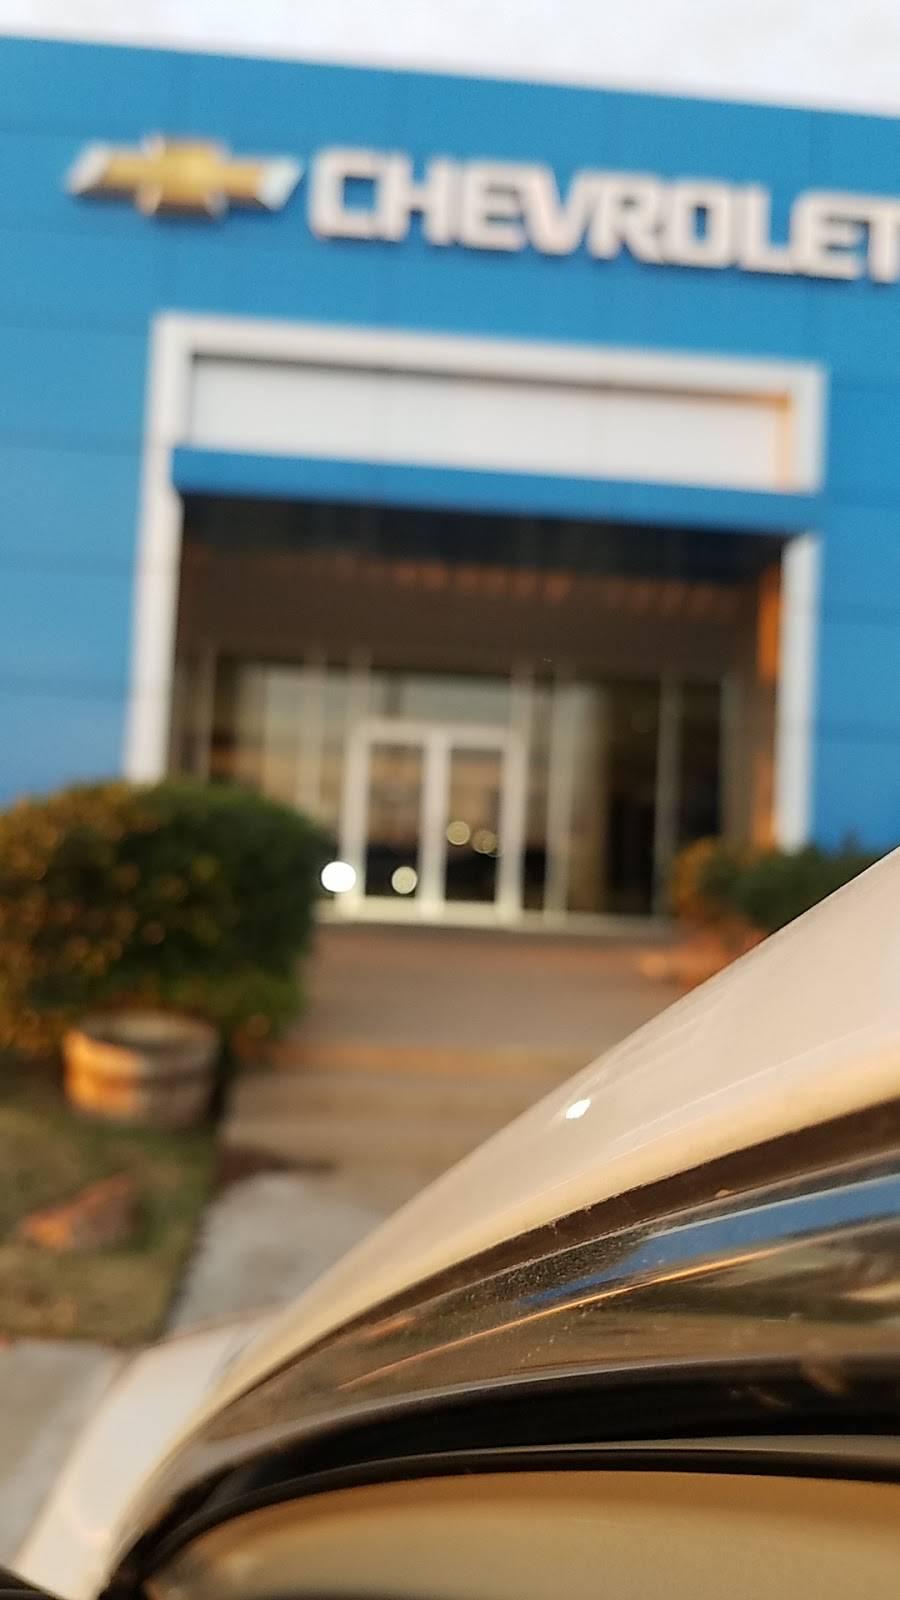 All American Chevrolet - car dealer  | Photo 1 of 7 | Address: 8802 US-84, Slaton, TX 79364, USA | Phone: (806) 828-6261